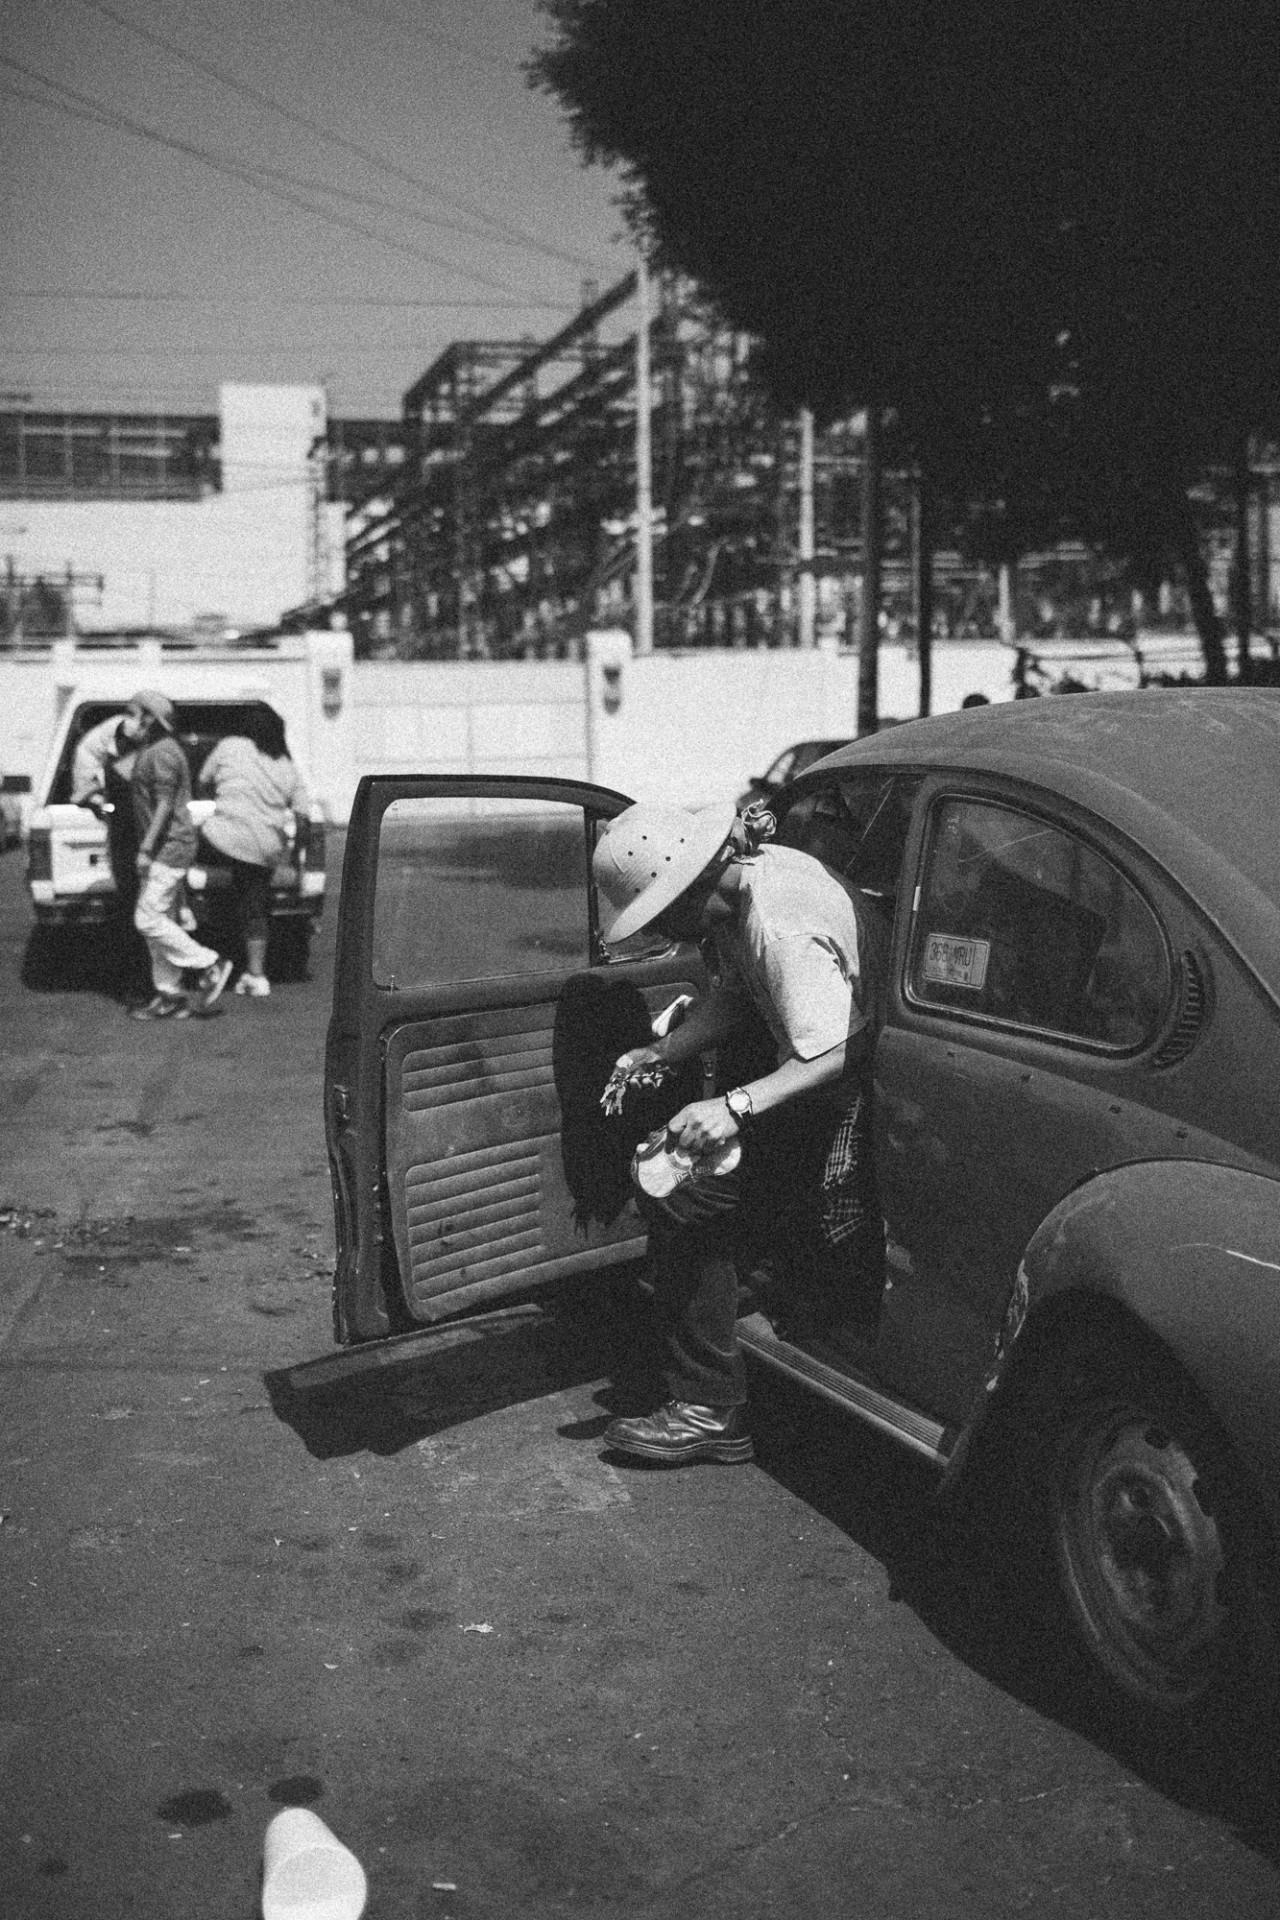 JANNIS KEIL Film & Foto #5